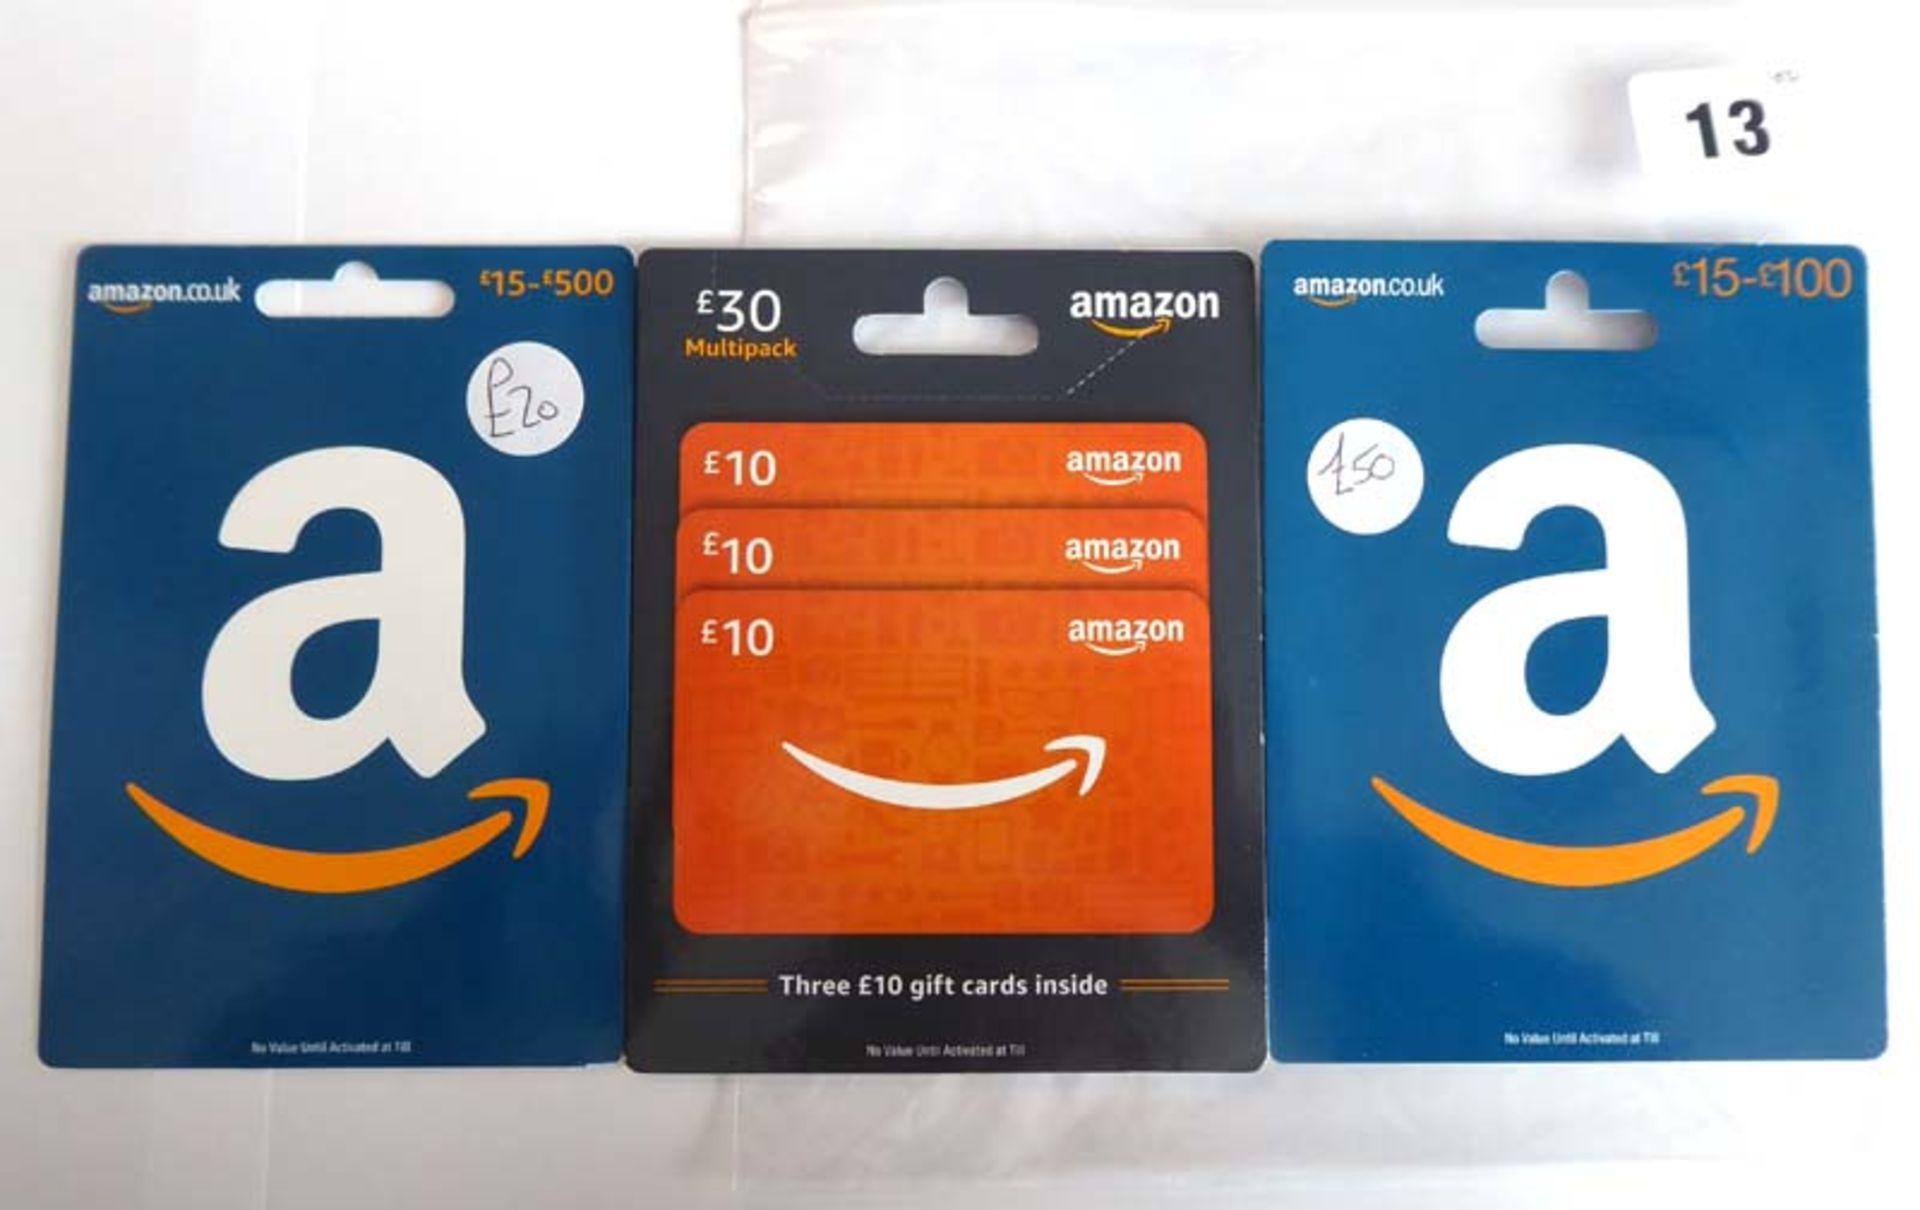 Lot 13 - Amazon (x3) - Total face value £100